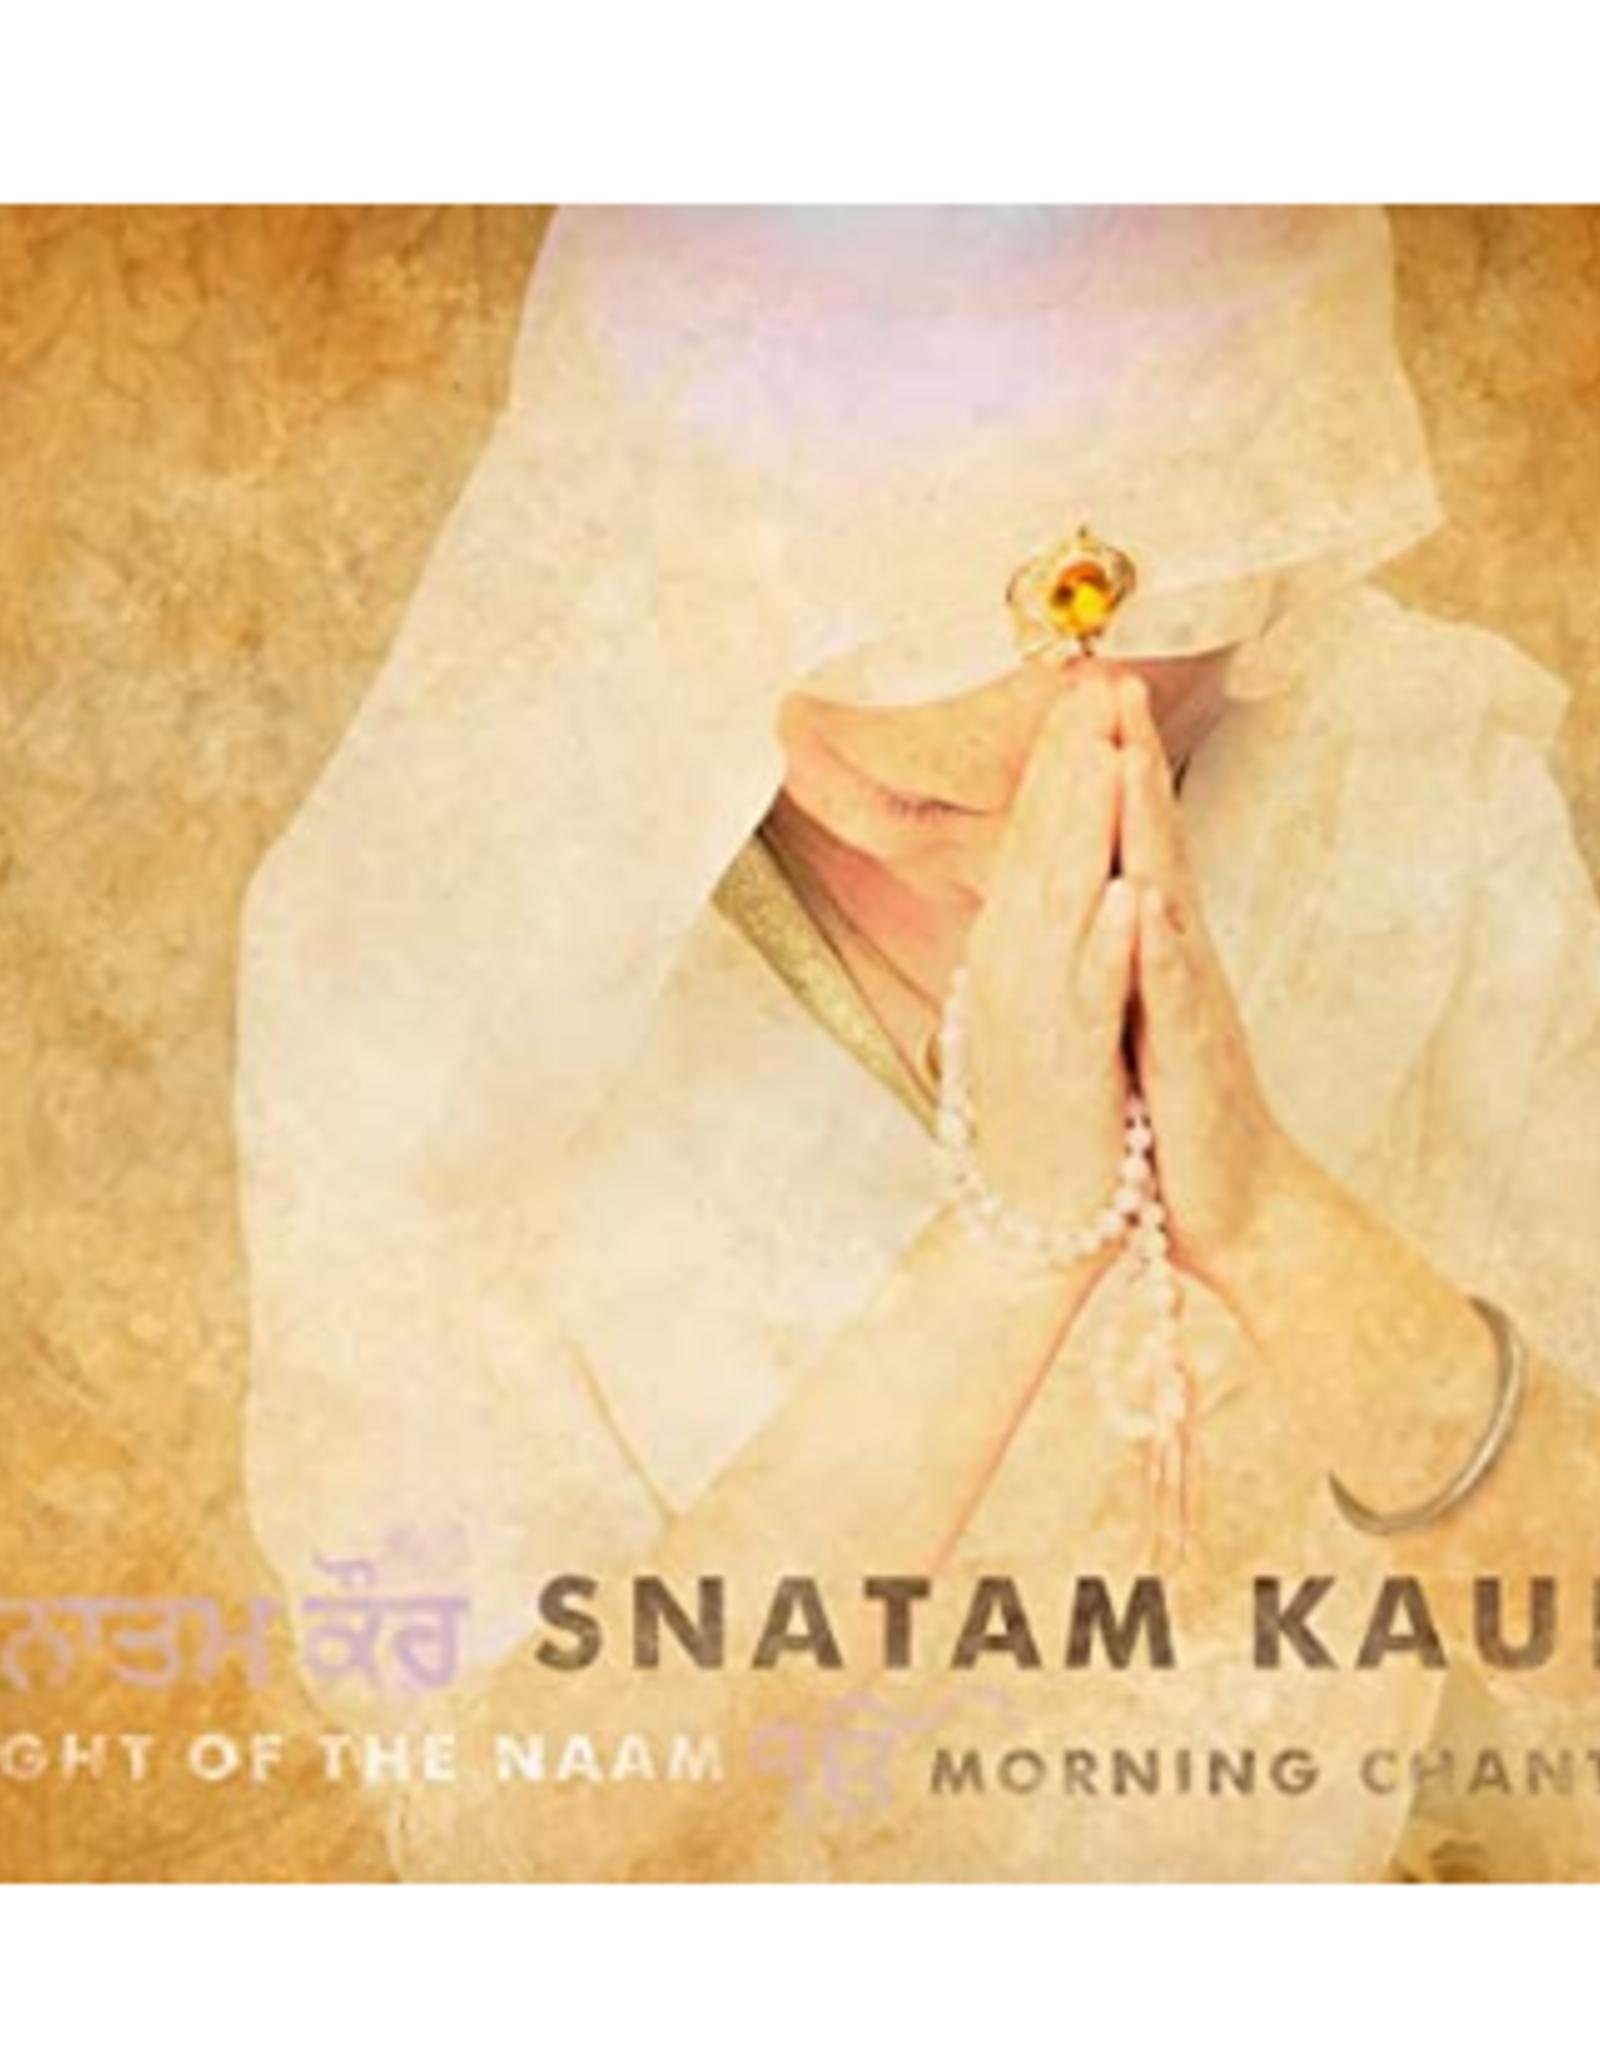 Snatam Kaur Light of the Naam Morning Chants CD by Snatam Kaur